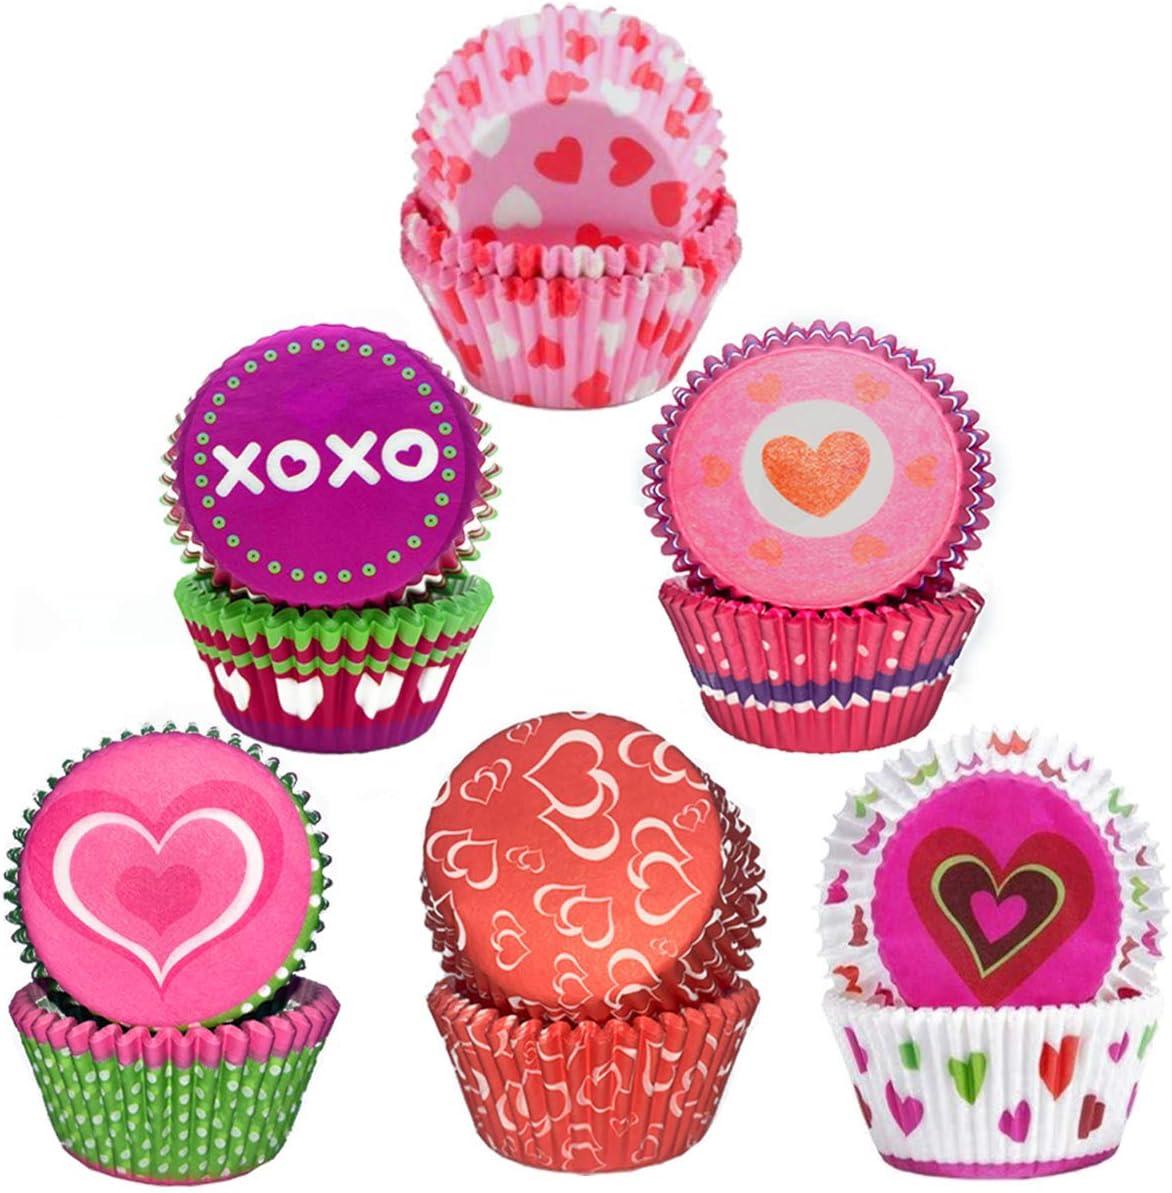 Fundas Papel para Cupcakes con patr/ón Amor Envoltorio de Muffins 6 Estilos para Postres Hornear Pastel Tarta Cumplea/ños Bodas Fiesta Rojo Fadaar Muffin Papel Magdalenas